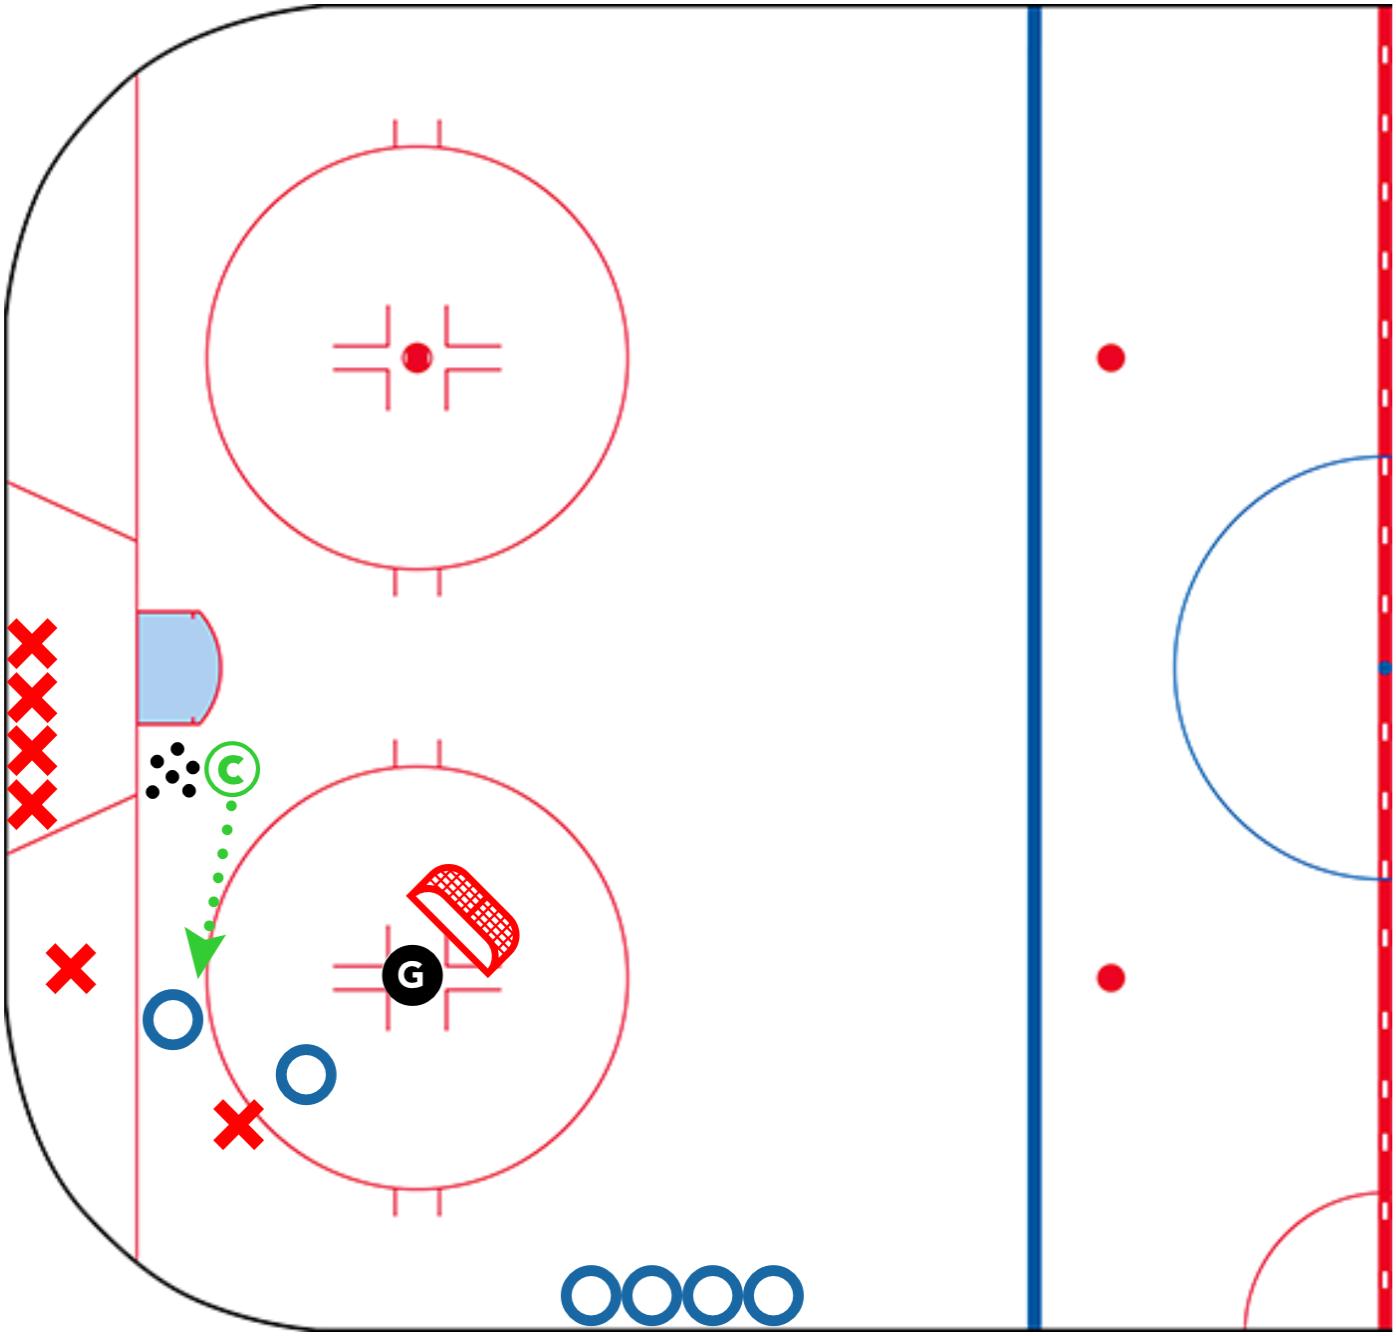 small-area-game-corner-2v2-CoachThem